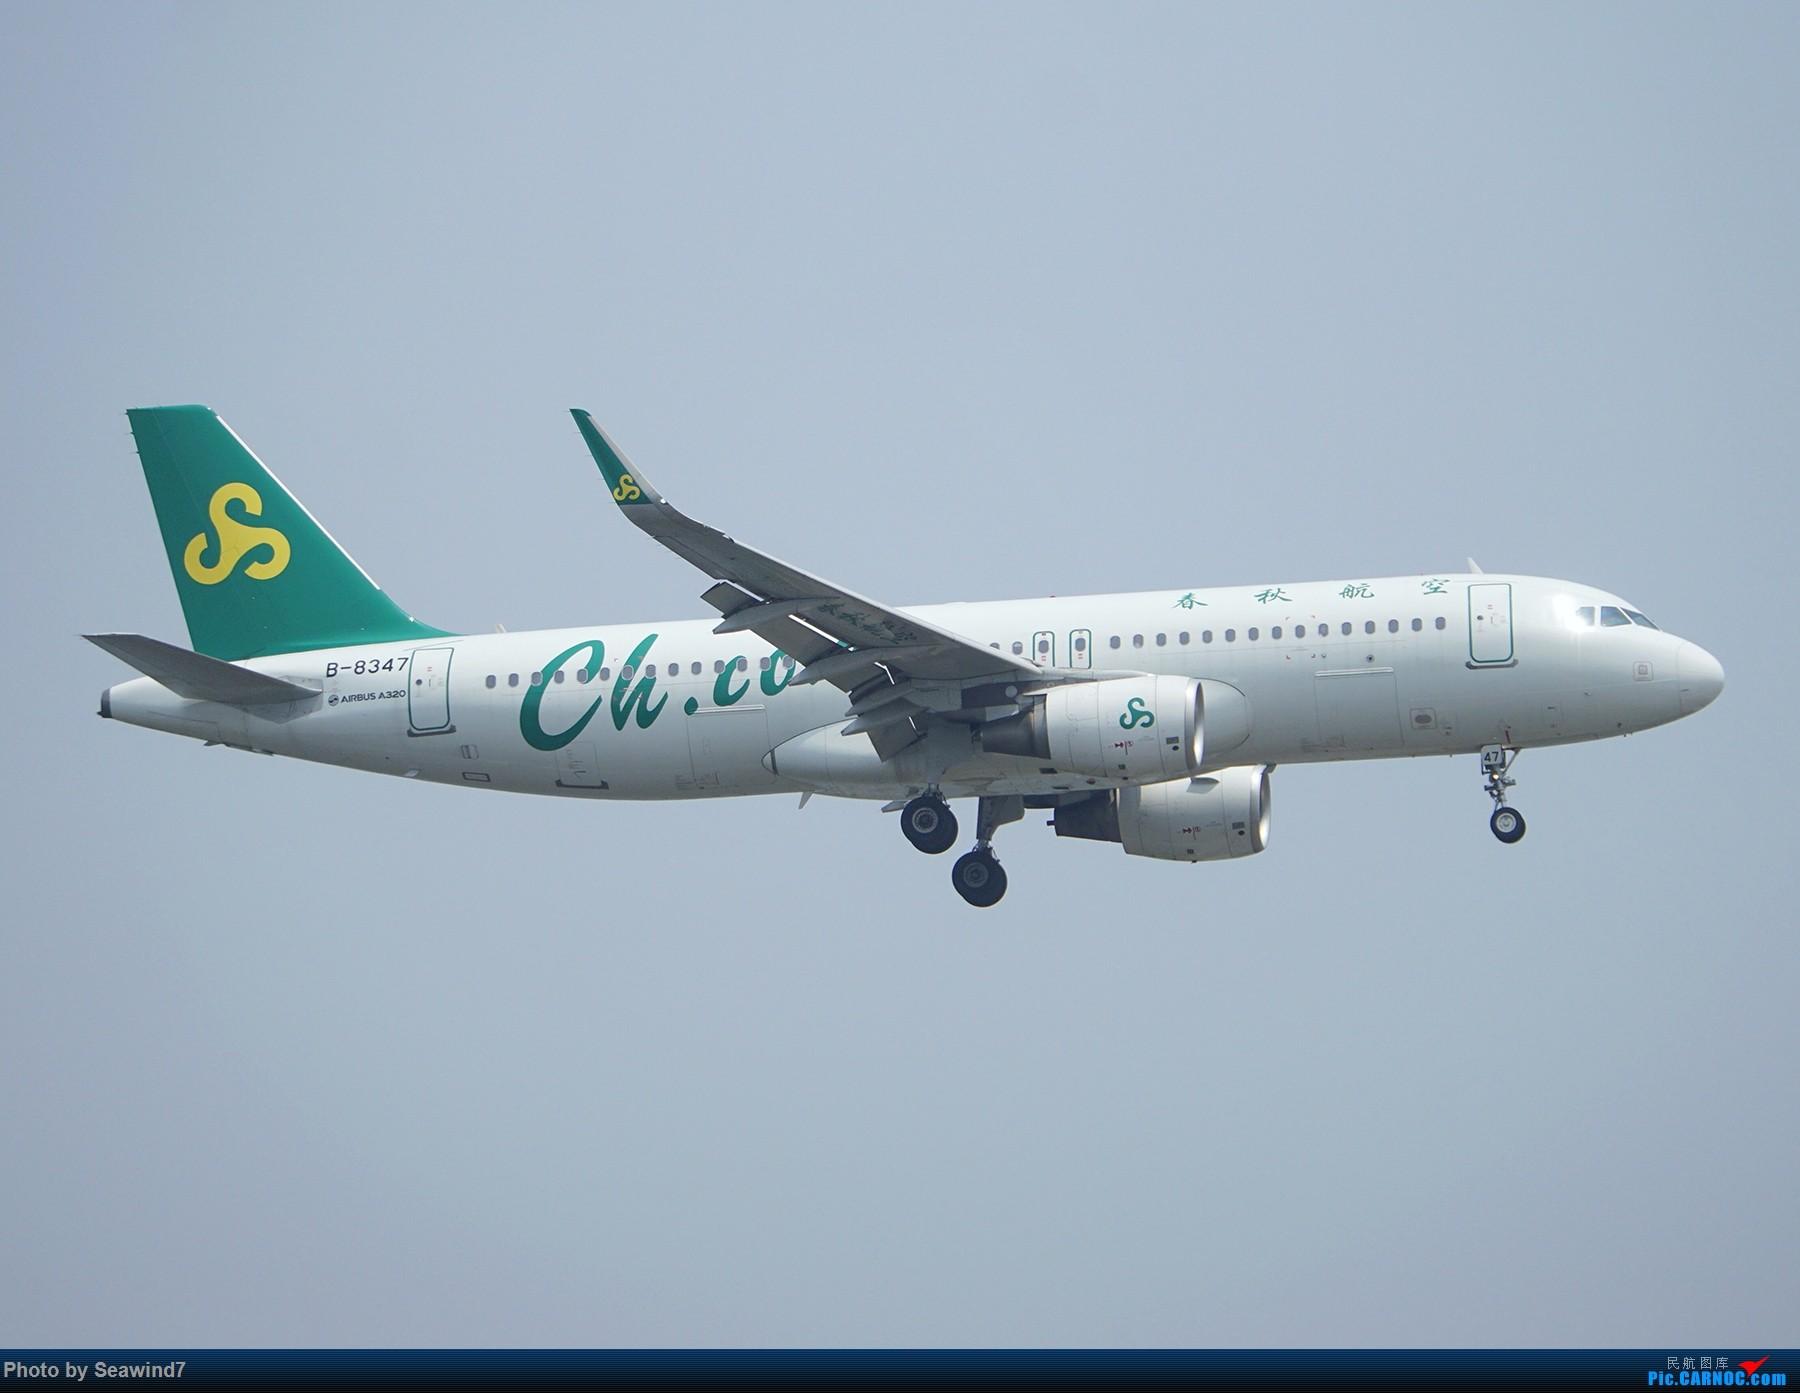 Re:[原创]新手的五一假期(含玩具总动员) AIRBUS A320-200 B-8347 中国上海虹桥国际机场